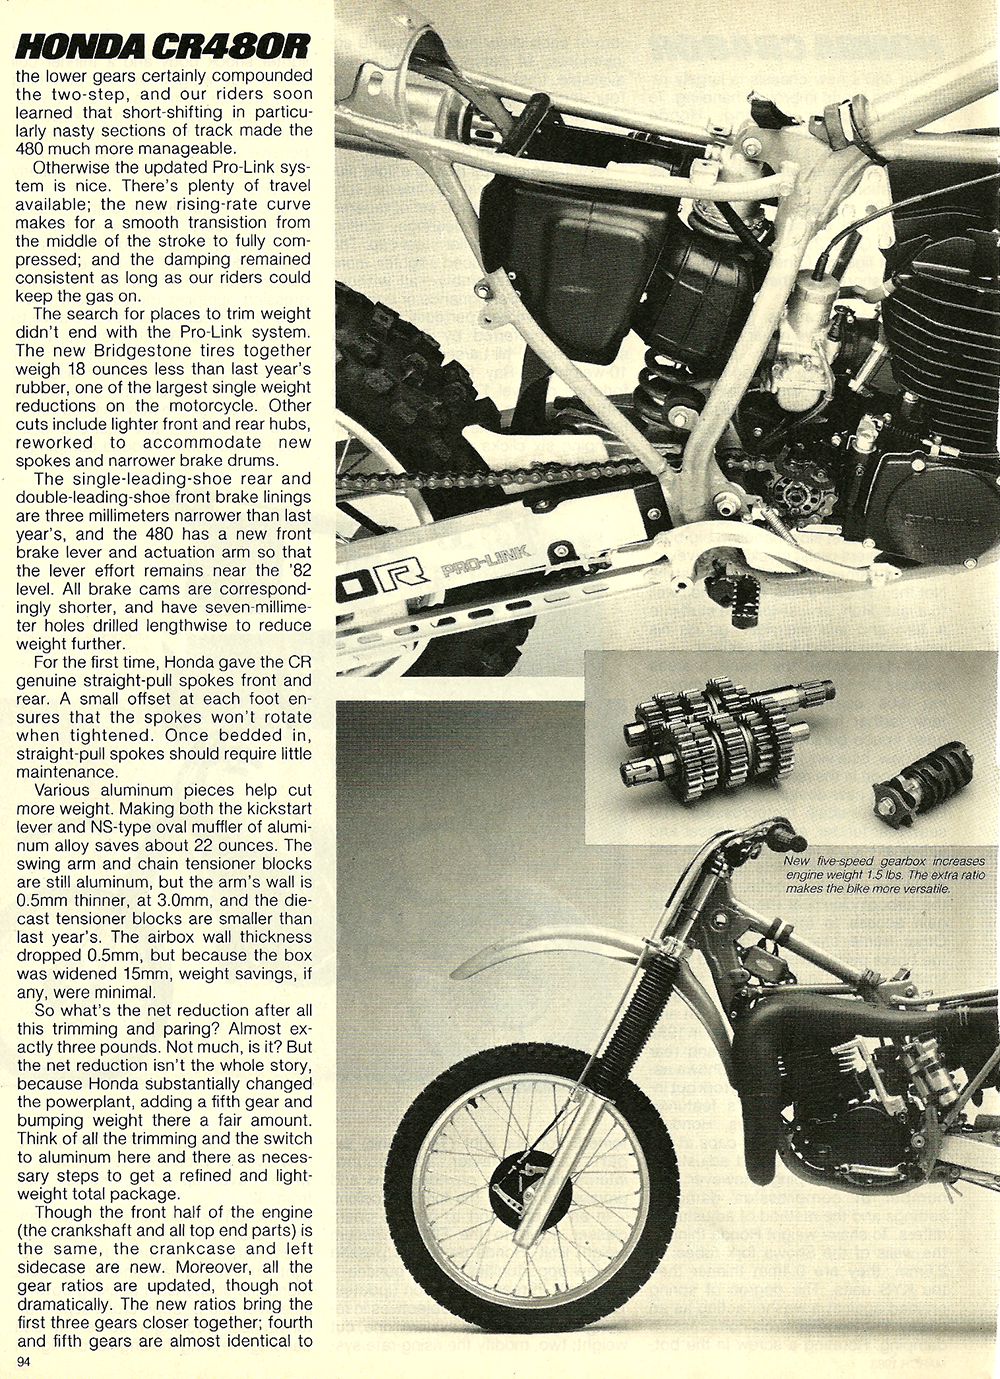 1983 Honda CR480R road test 5.jpg